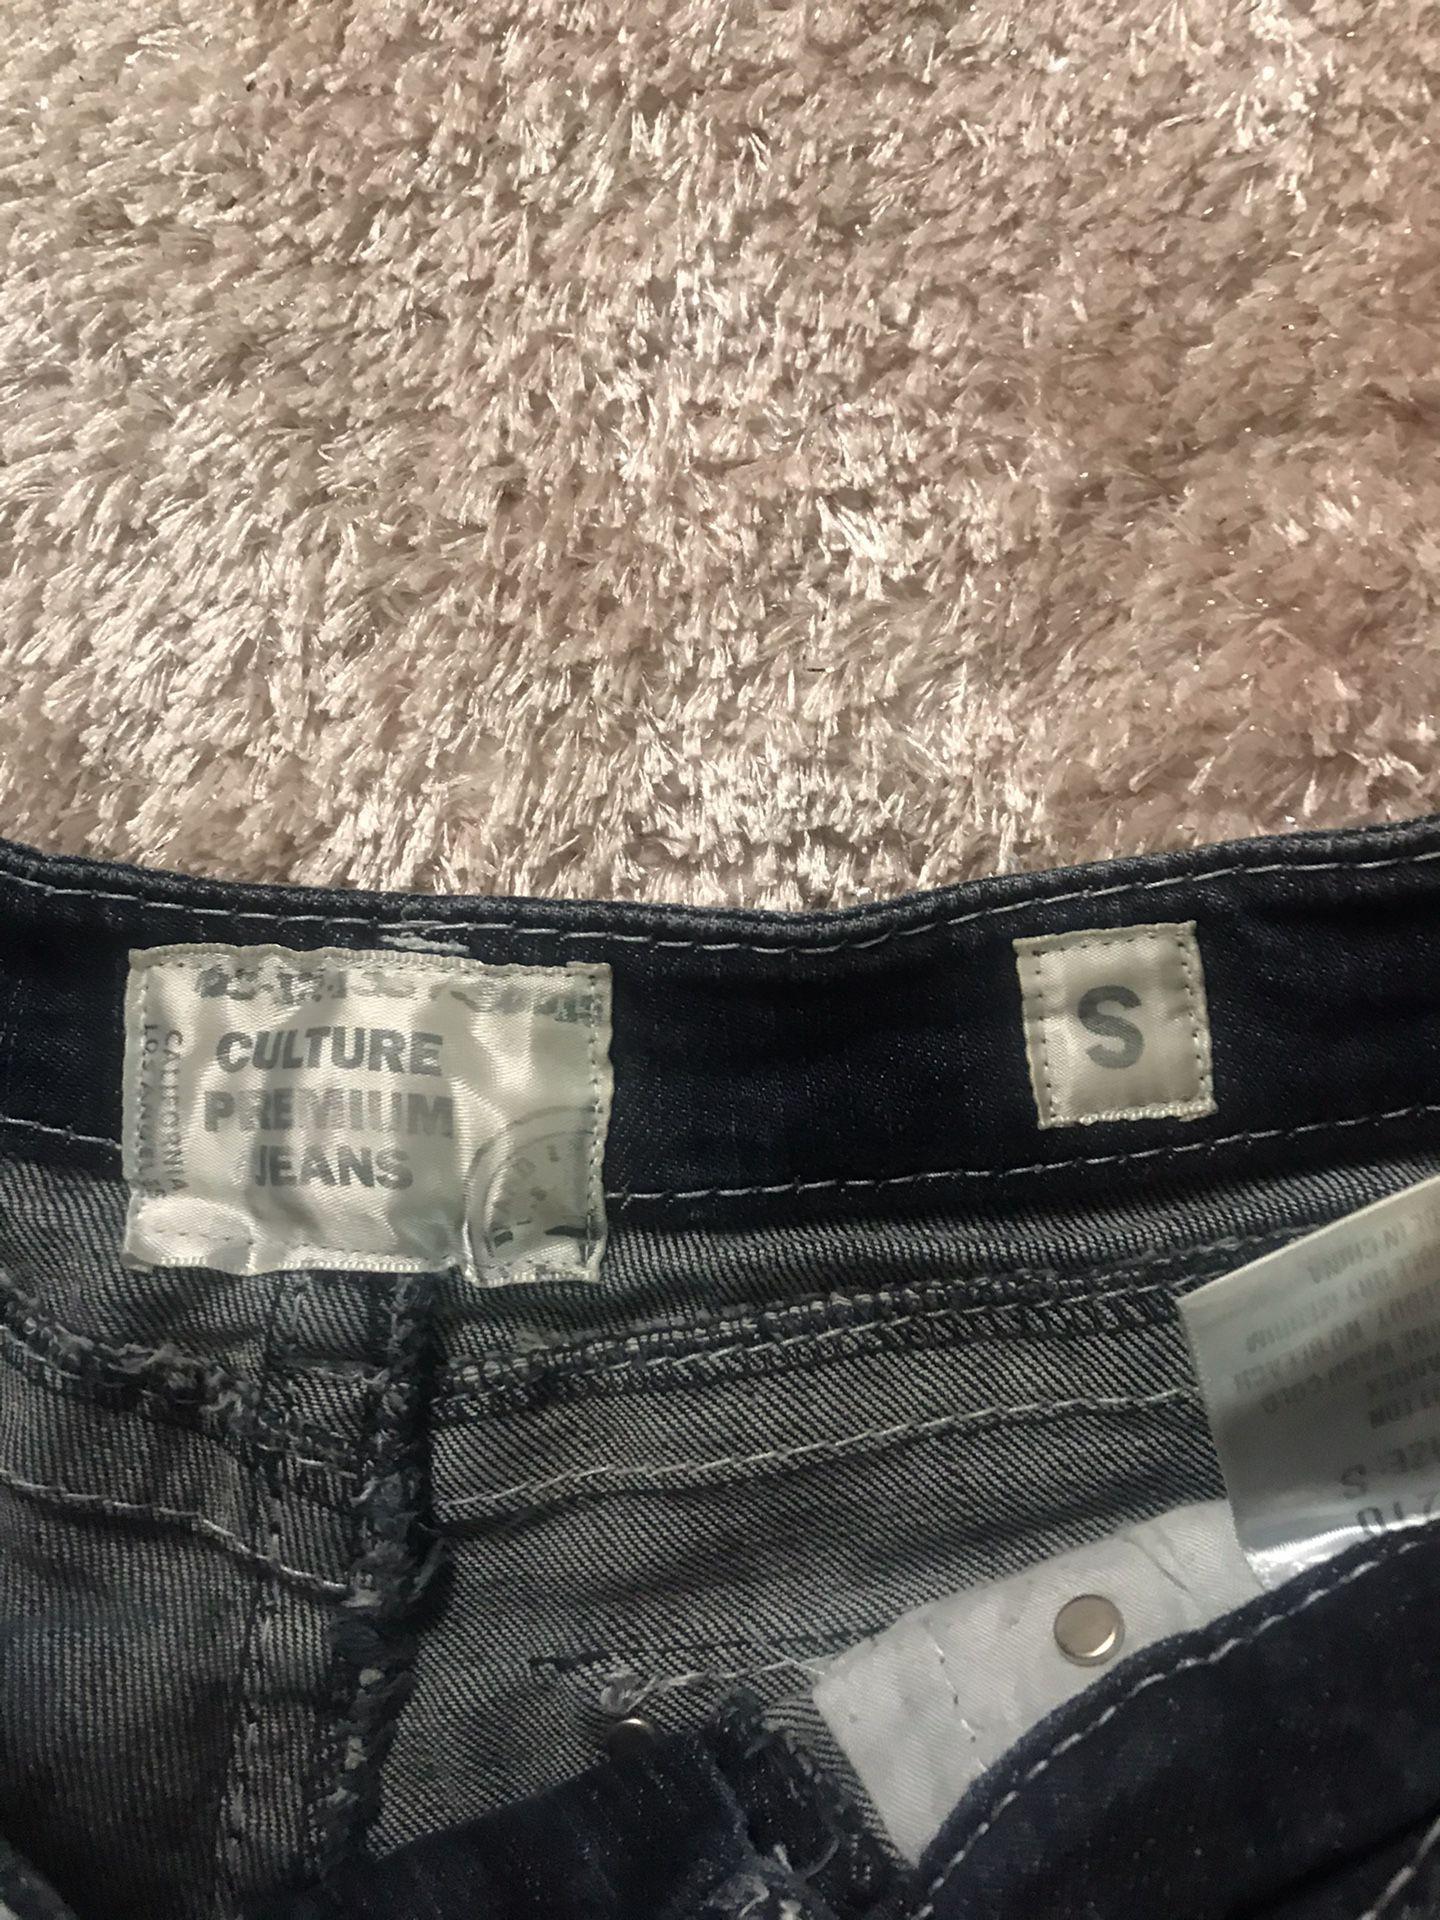 Premium Culture jean shorts